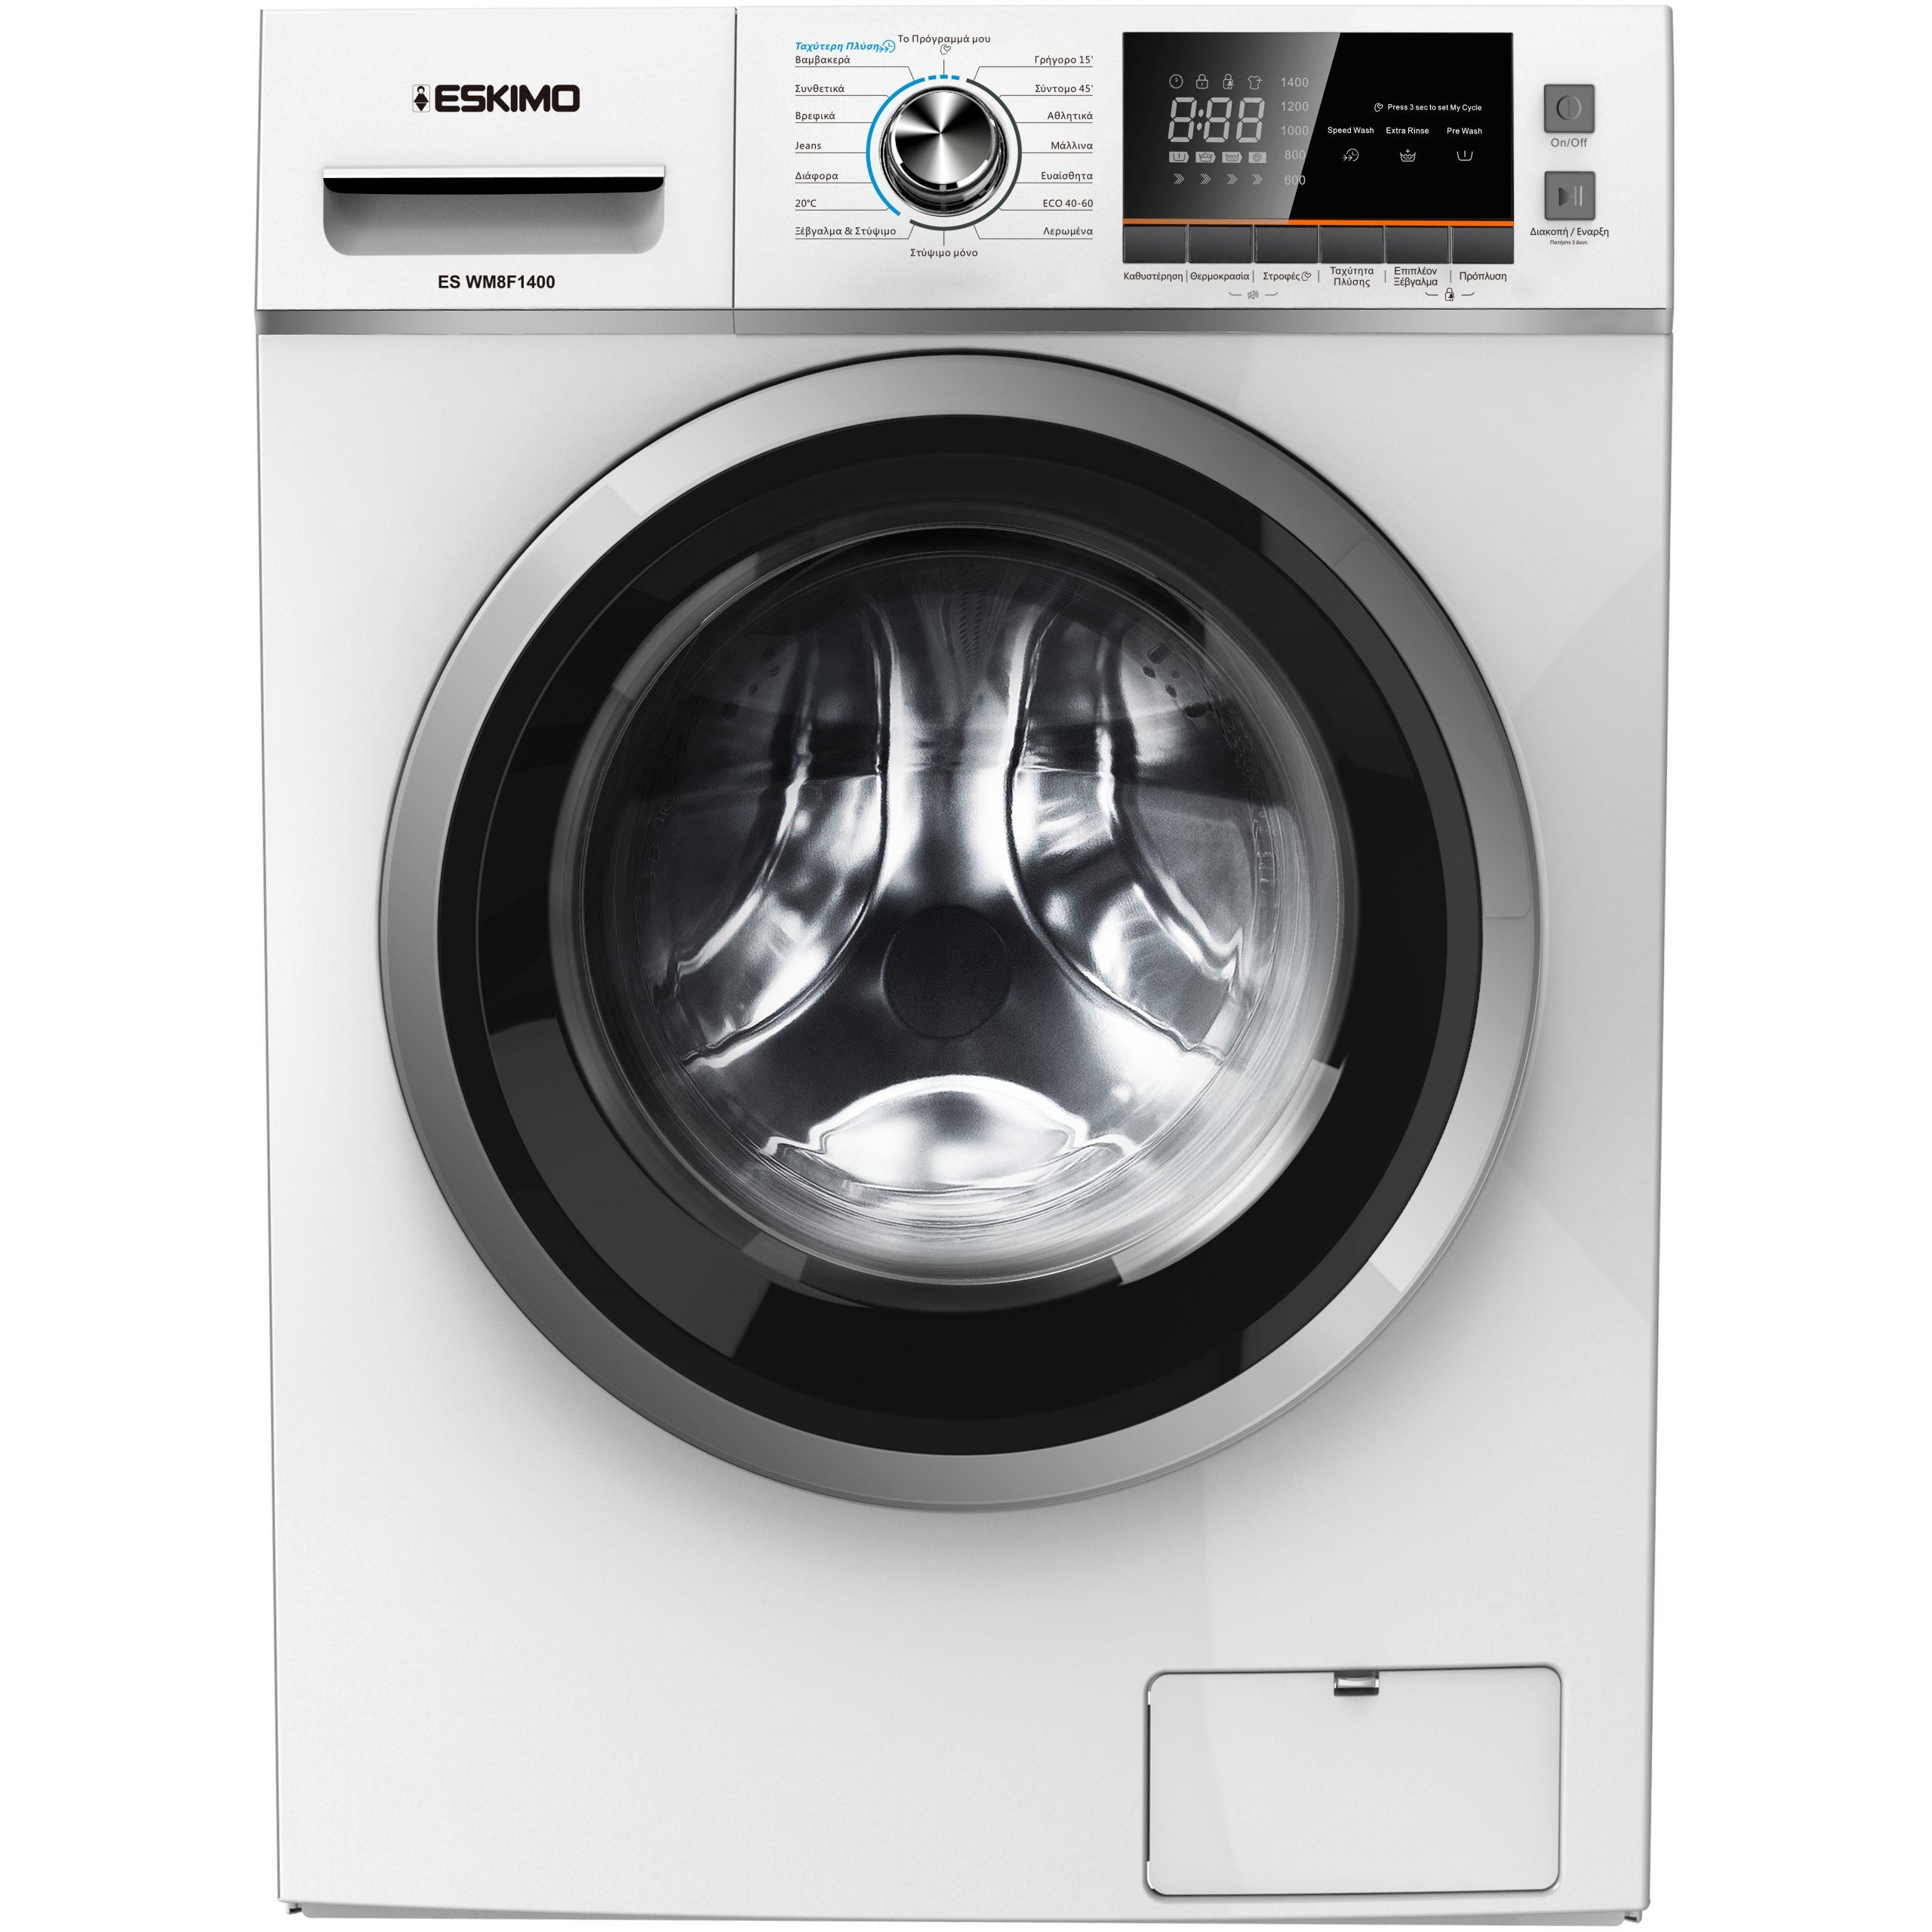 Eskimo Πλυντήριο Ρούχων ES WM8F1400